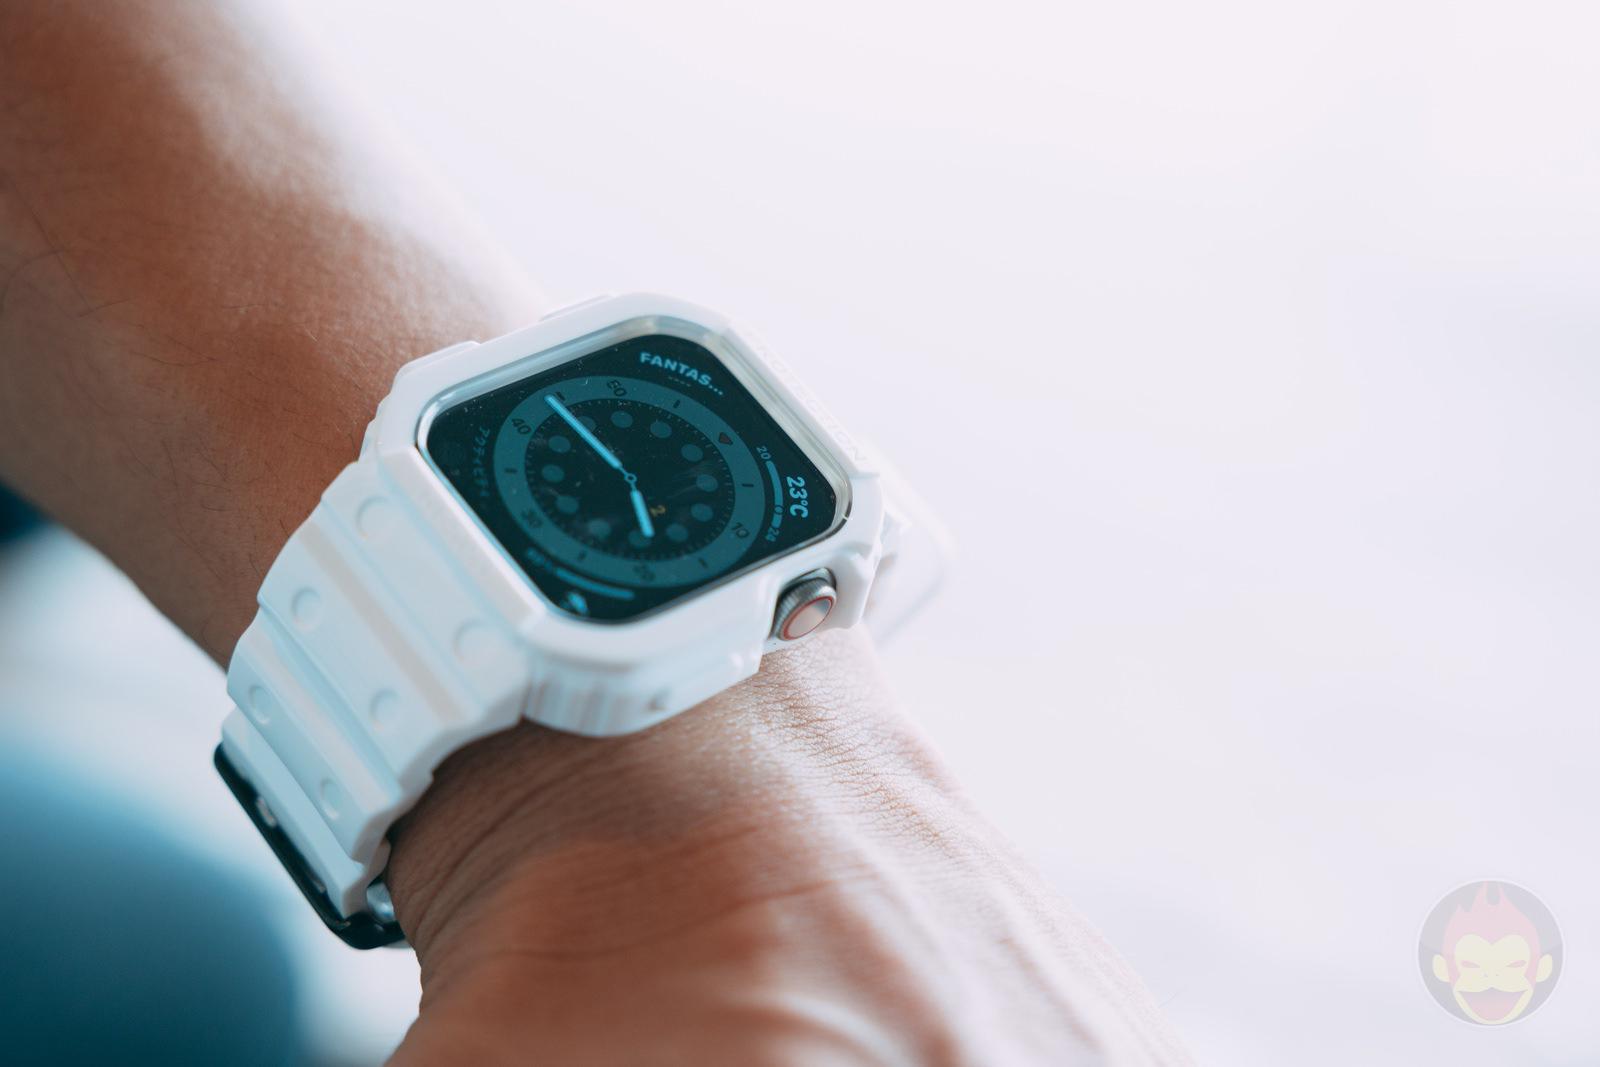 AmBand Apple Watch White G SHOCK Case 05